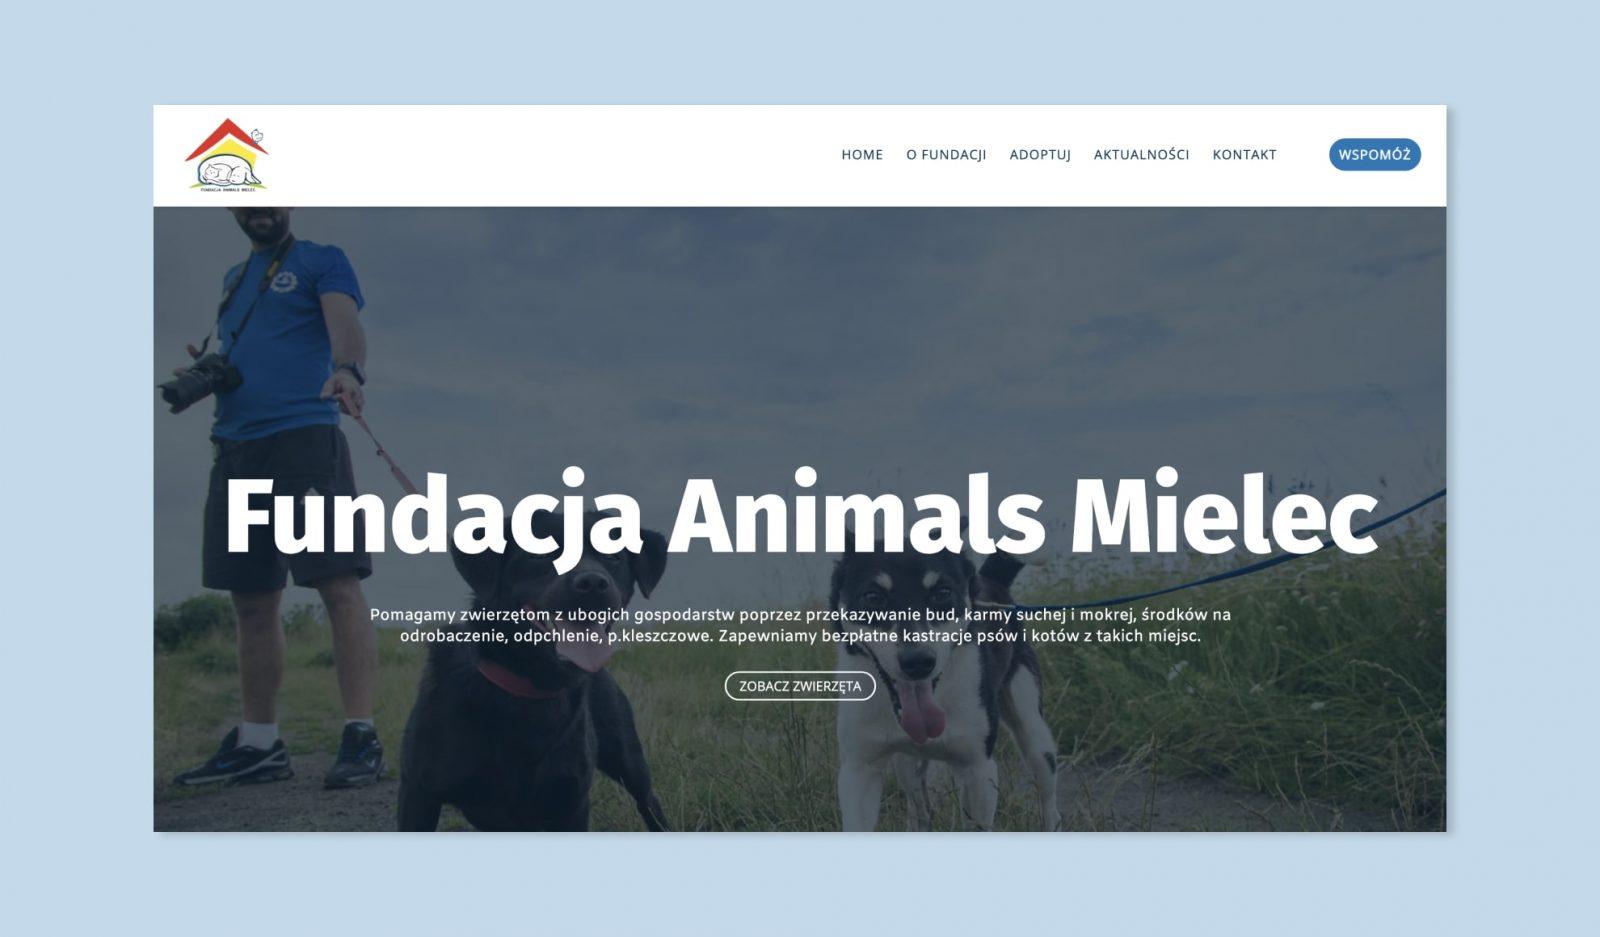 fundacja animal mielec case study thumbnail-min